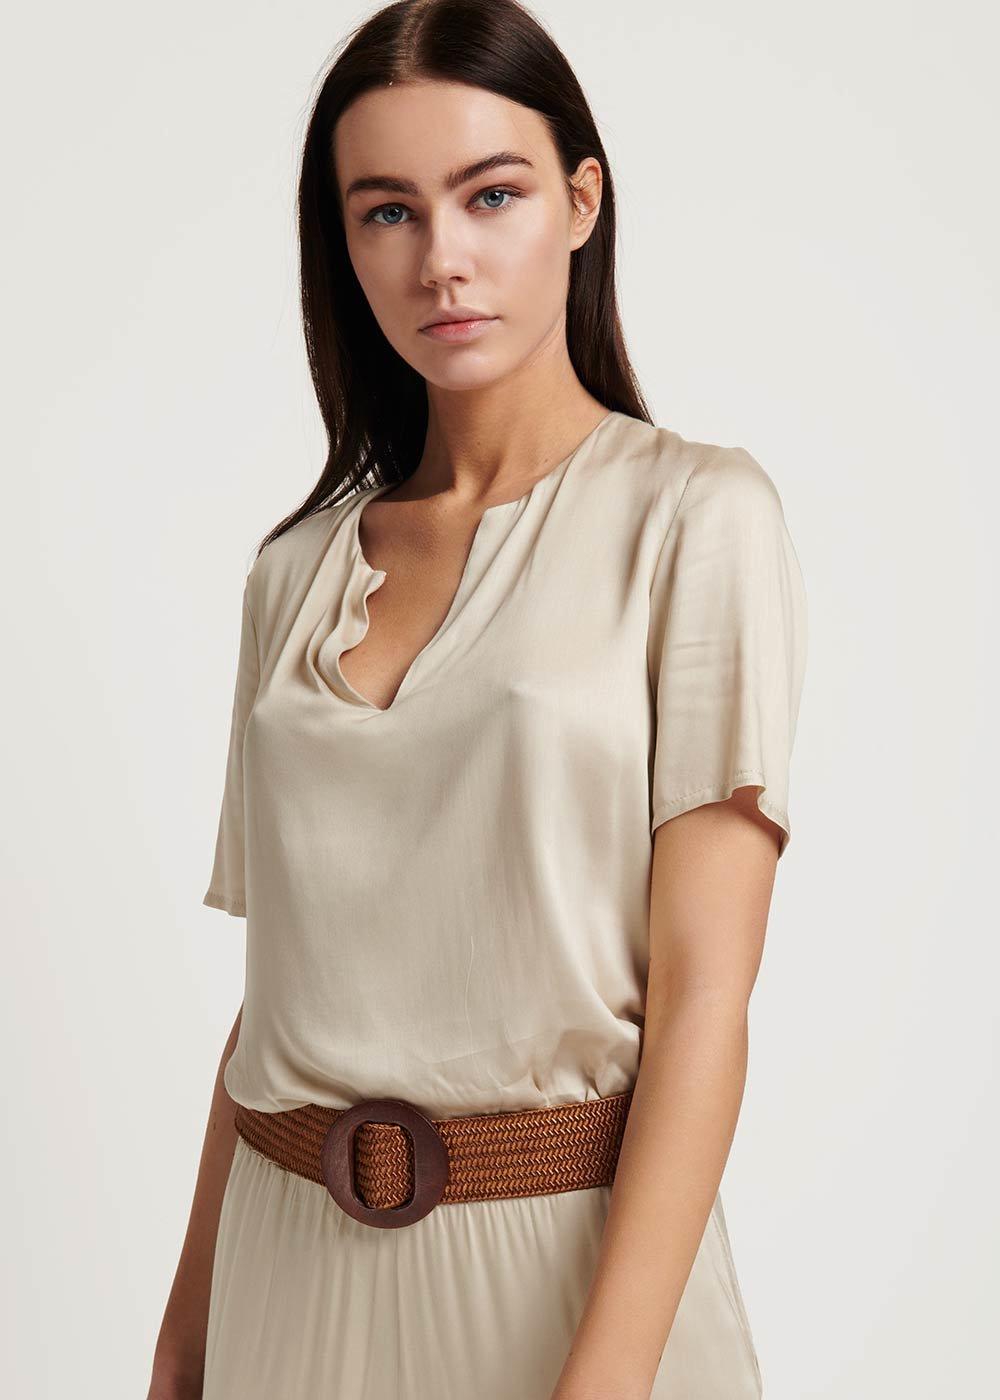 Sherry T-shirt with short sleeve - Light Beige - Woman